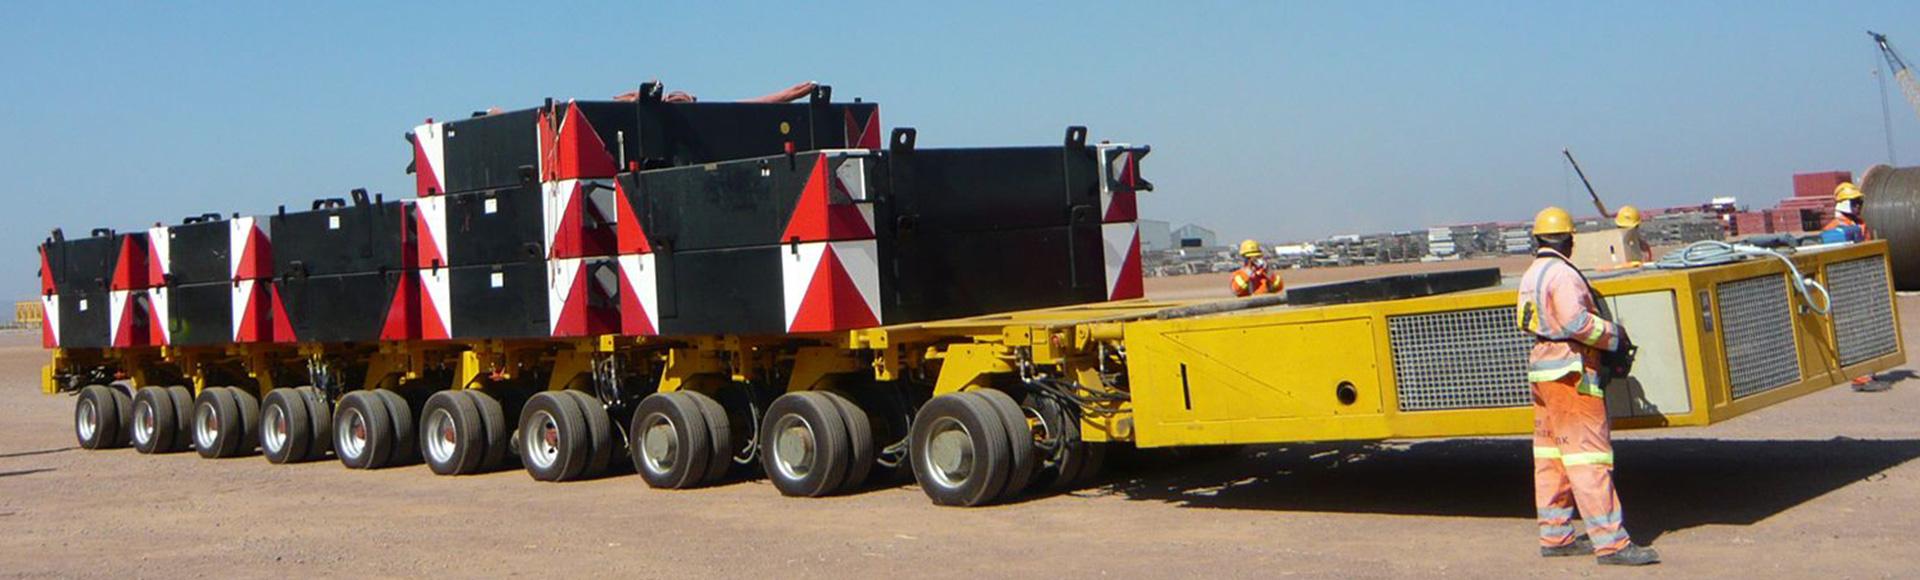 ABC Infra Equipments Pvt. Ltd.